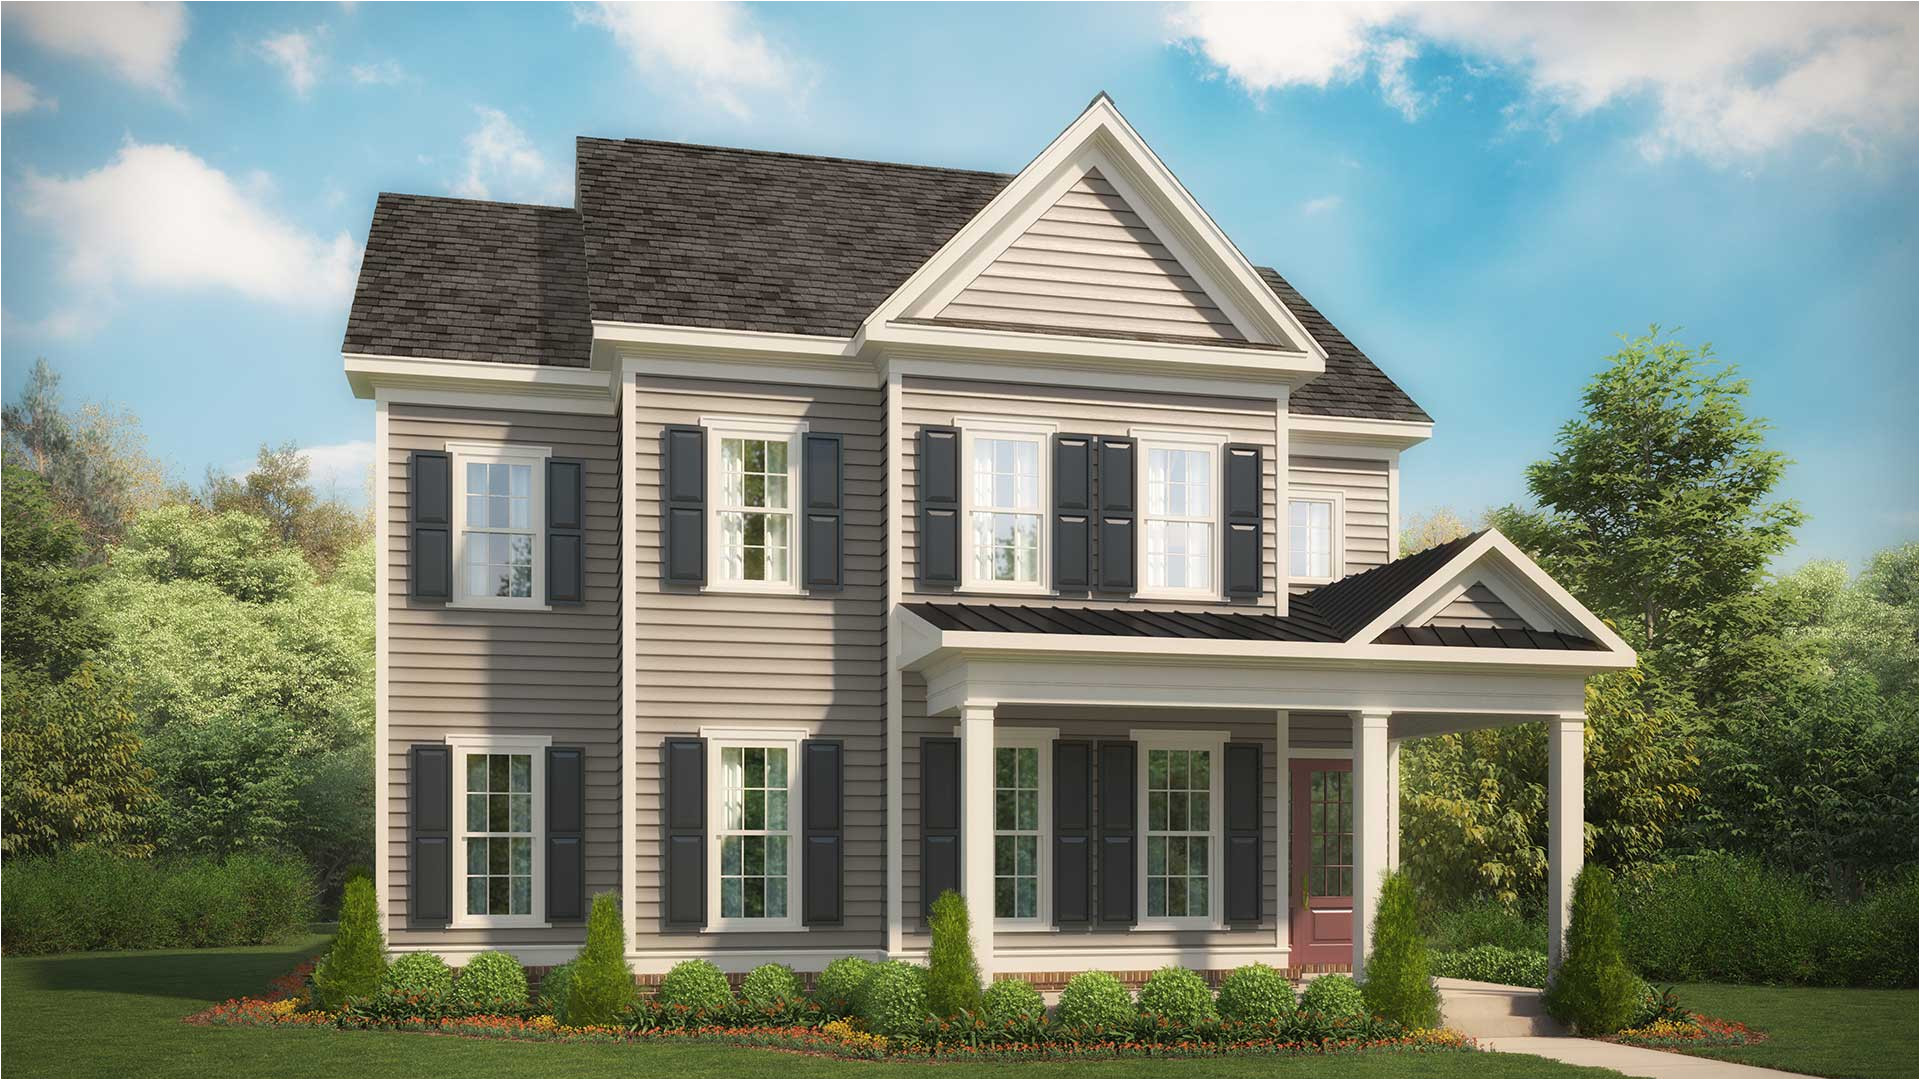 Preferred Homes Columbus Ga Inwood In Woodstock Ga New Homes Floor Plans by Stanley Martin Homes